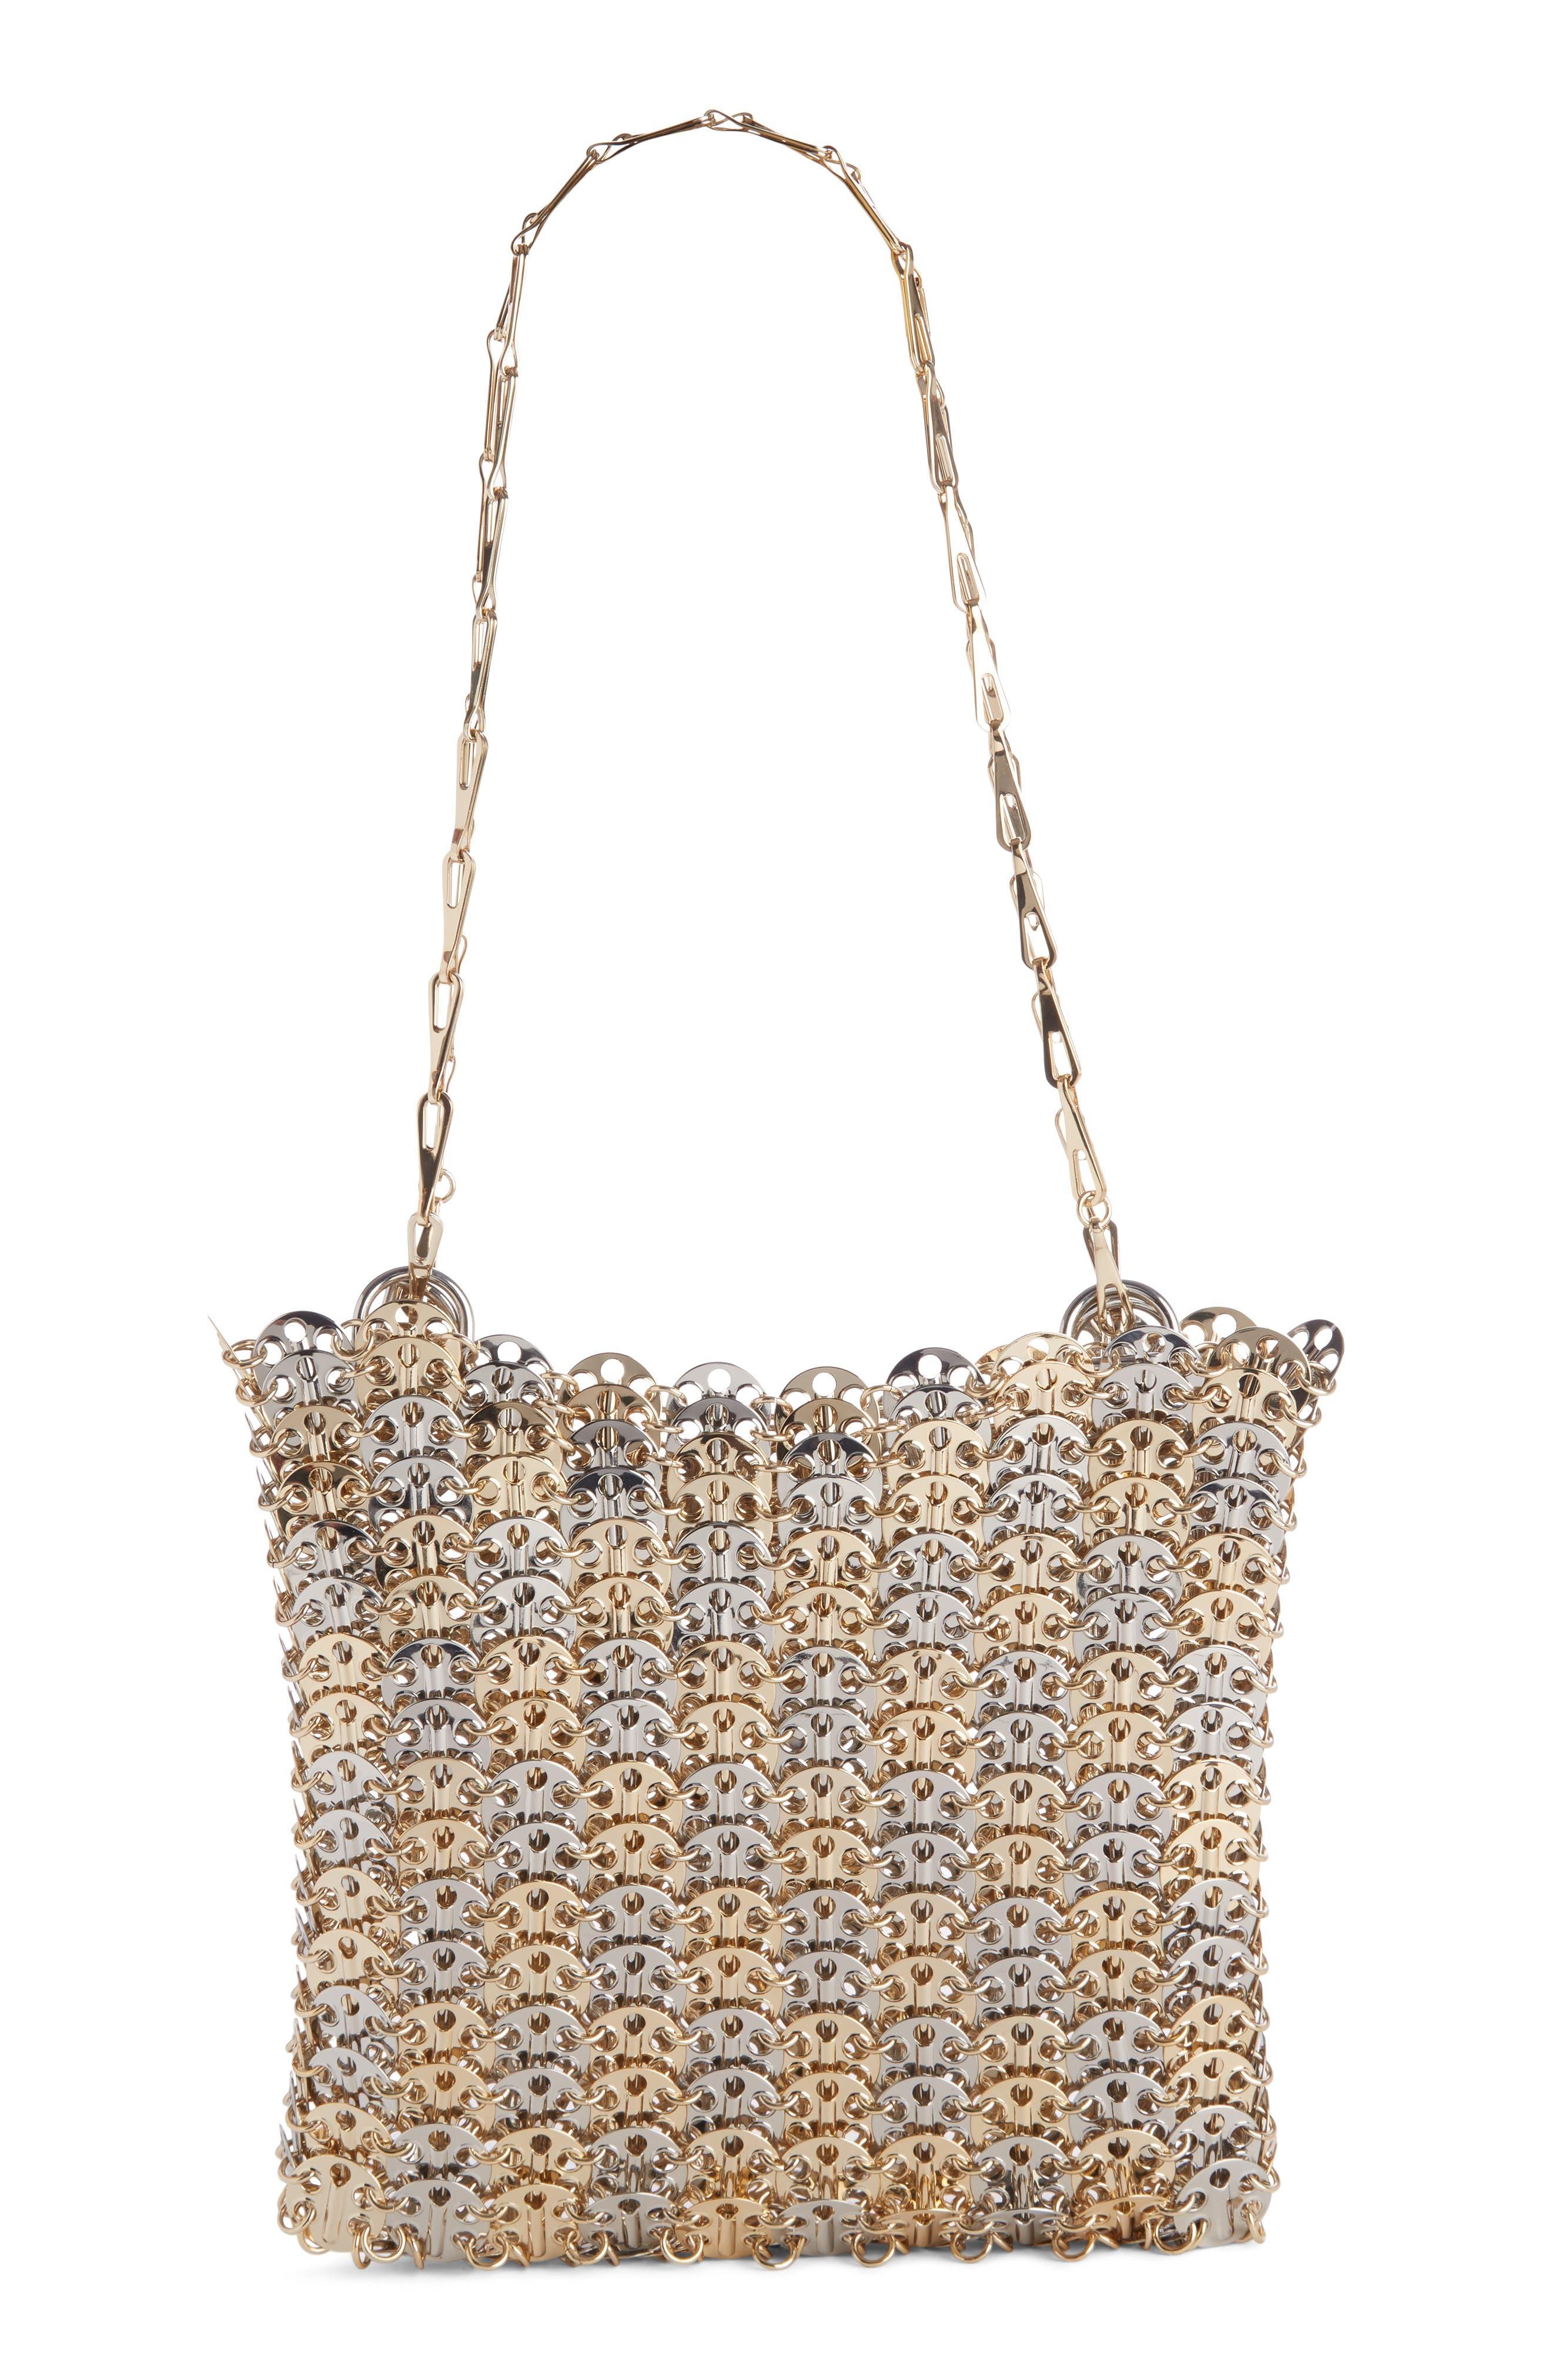 Leather Shoulder Bag,                             Main thumbnail 1, color,                             Silver/ Gold